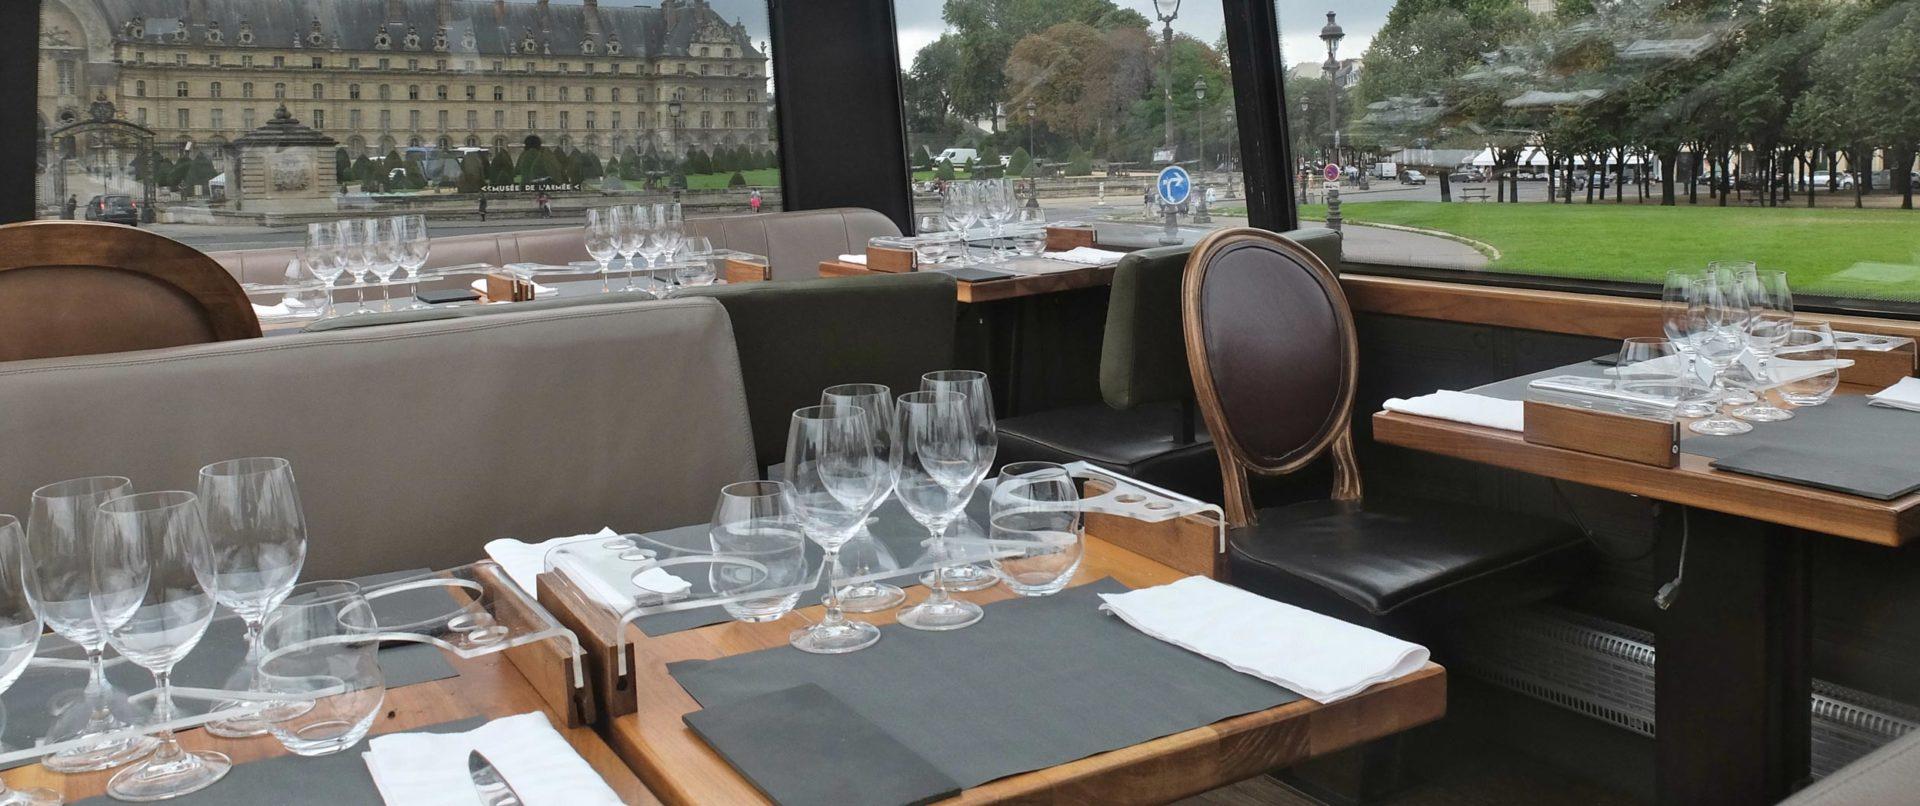 Bustronome-gourmet-experience-paris